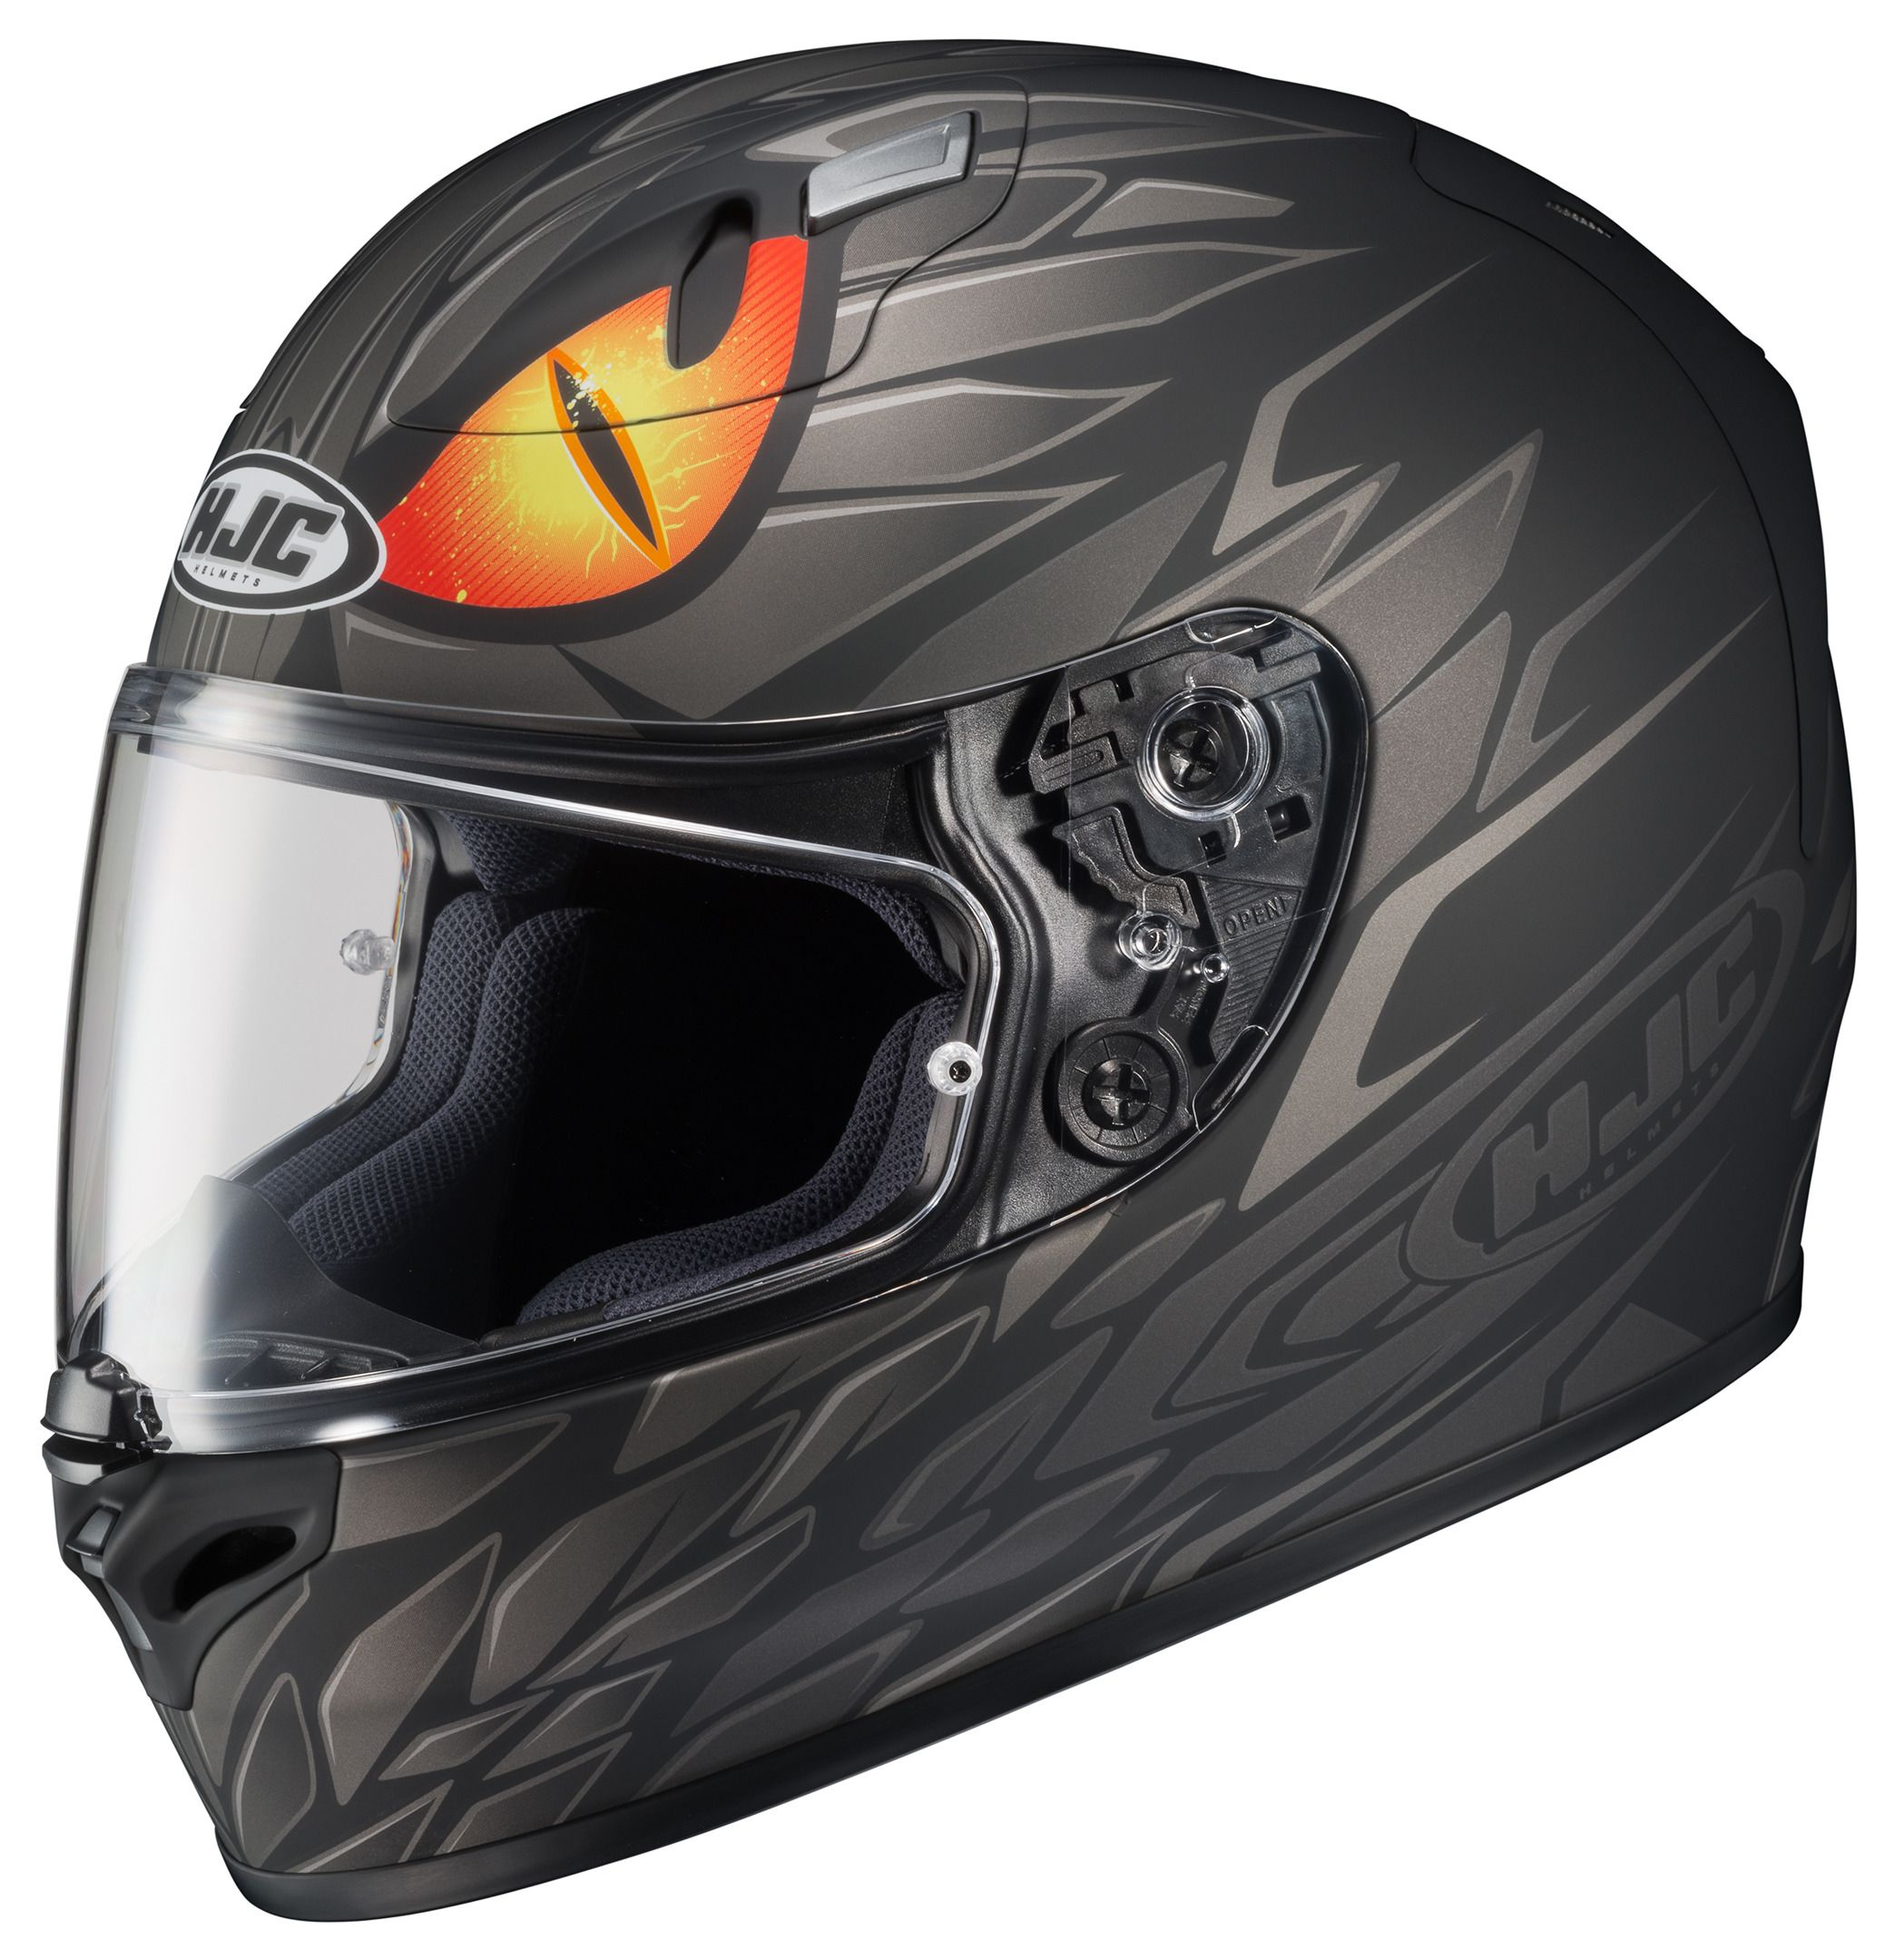 hjc fg 17 lorenzo mamba helmet revzilla. Black Bedroom Furniture Sets. Home Design Ideas